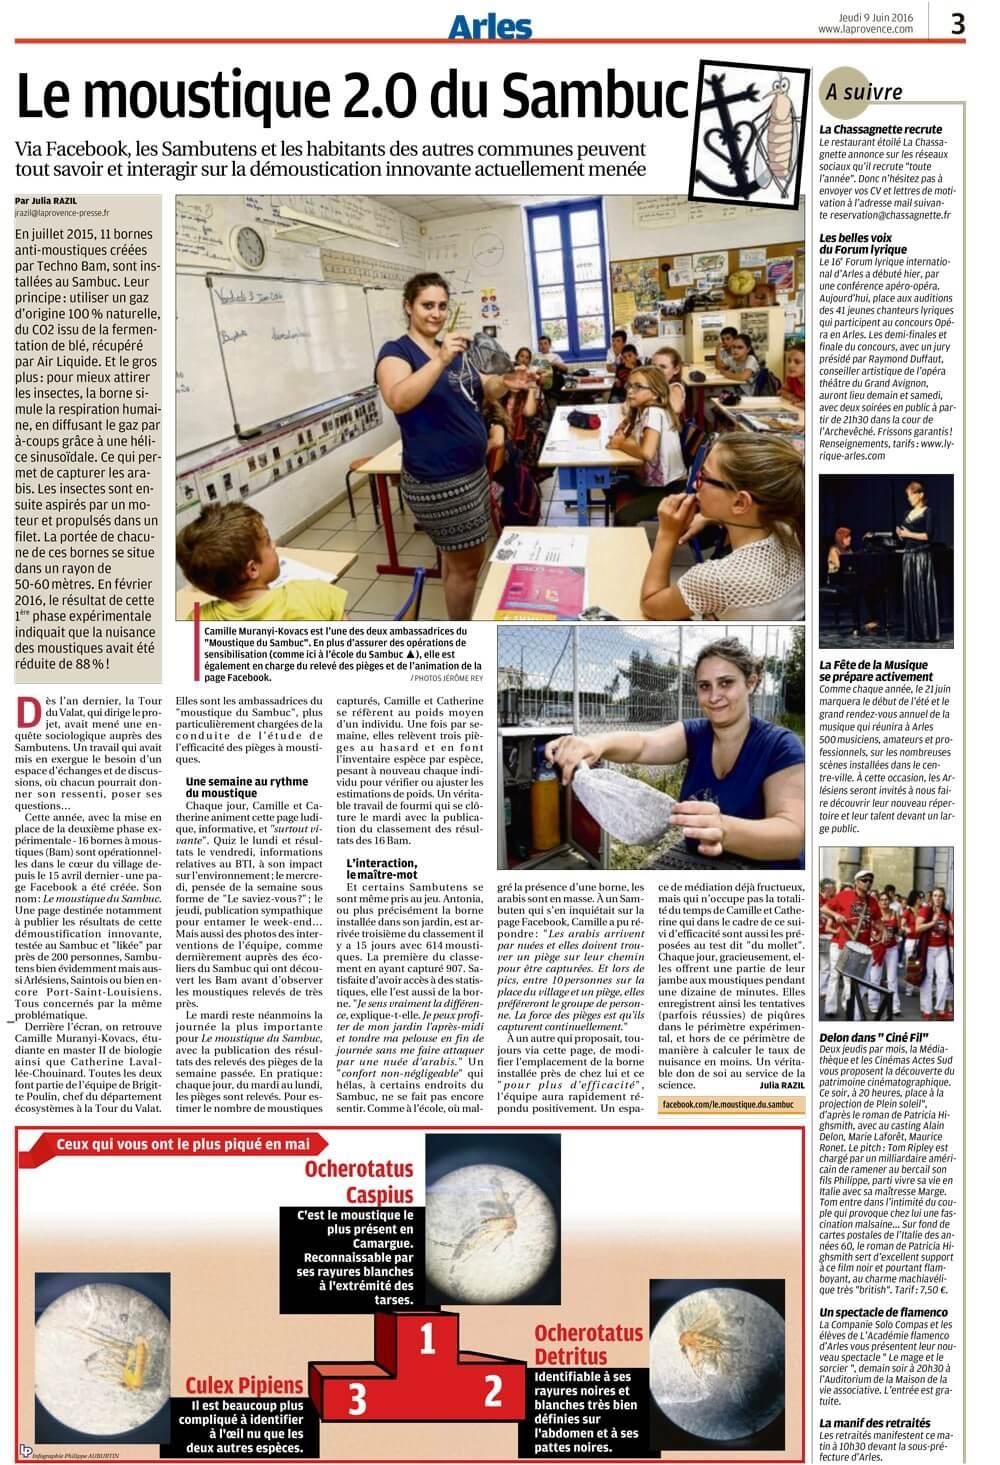 Article du 09/06/2016 - La Provence - Arles